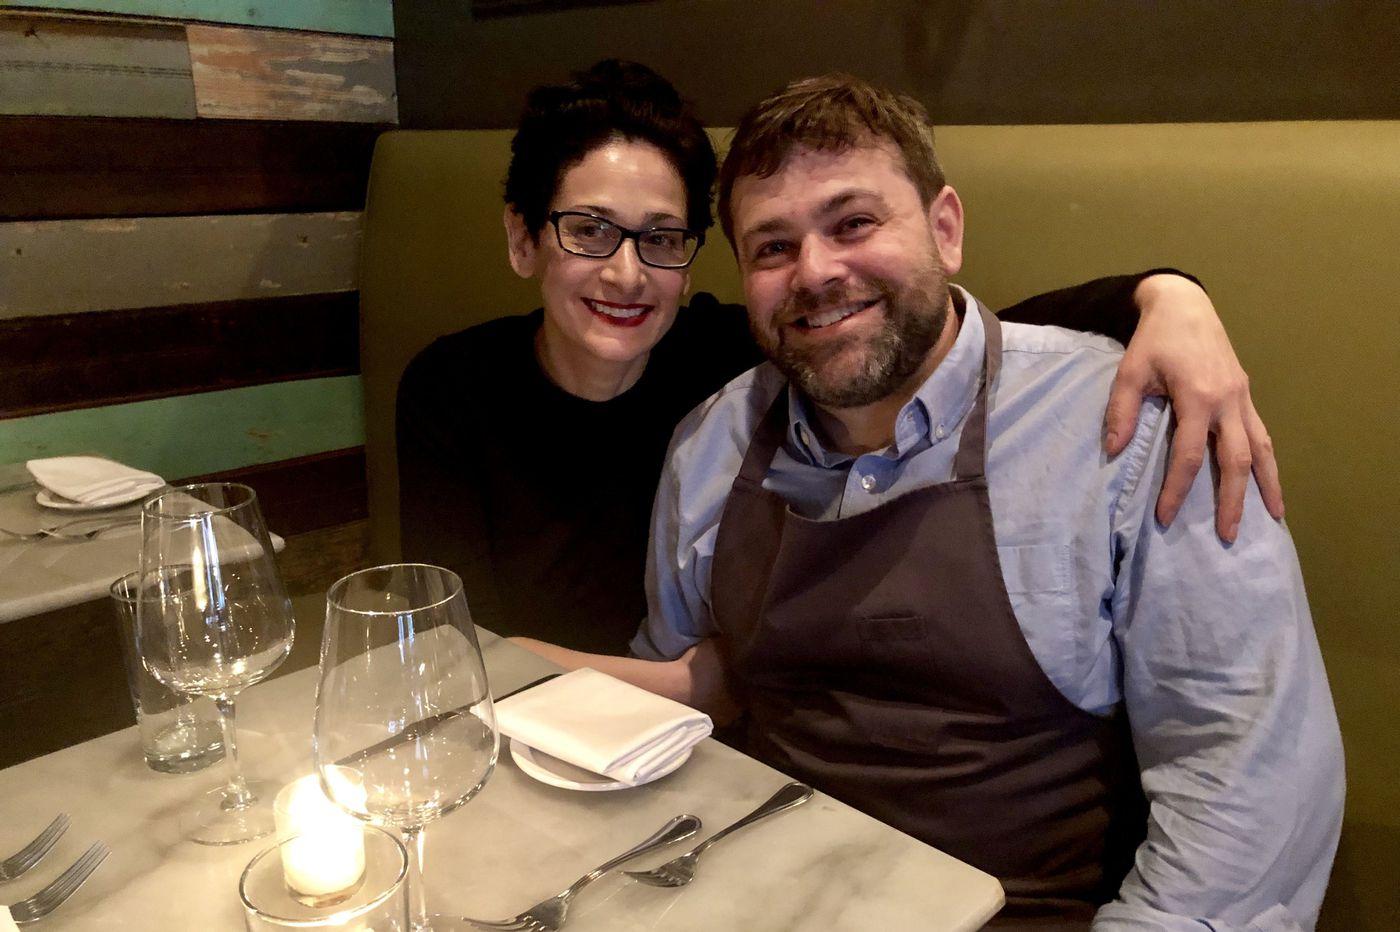 Pumpkin BYOB approaches 15: A new course for a veteran restaurant